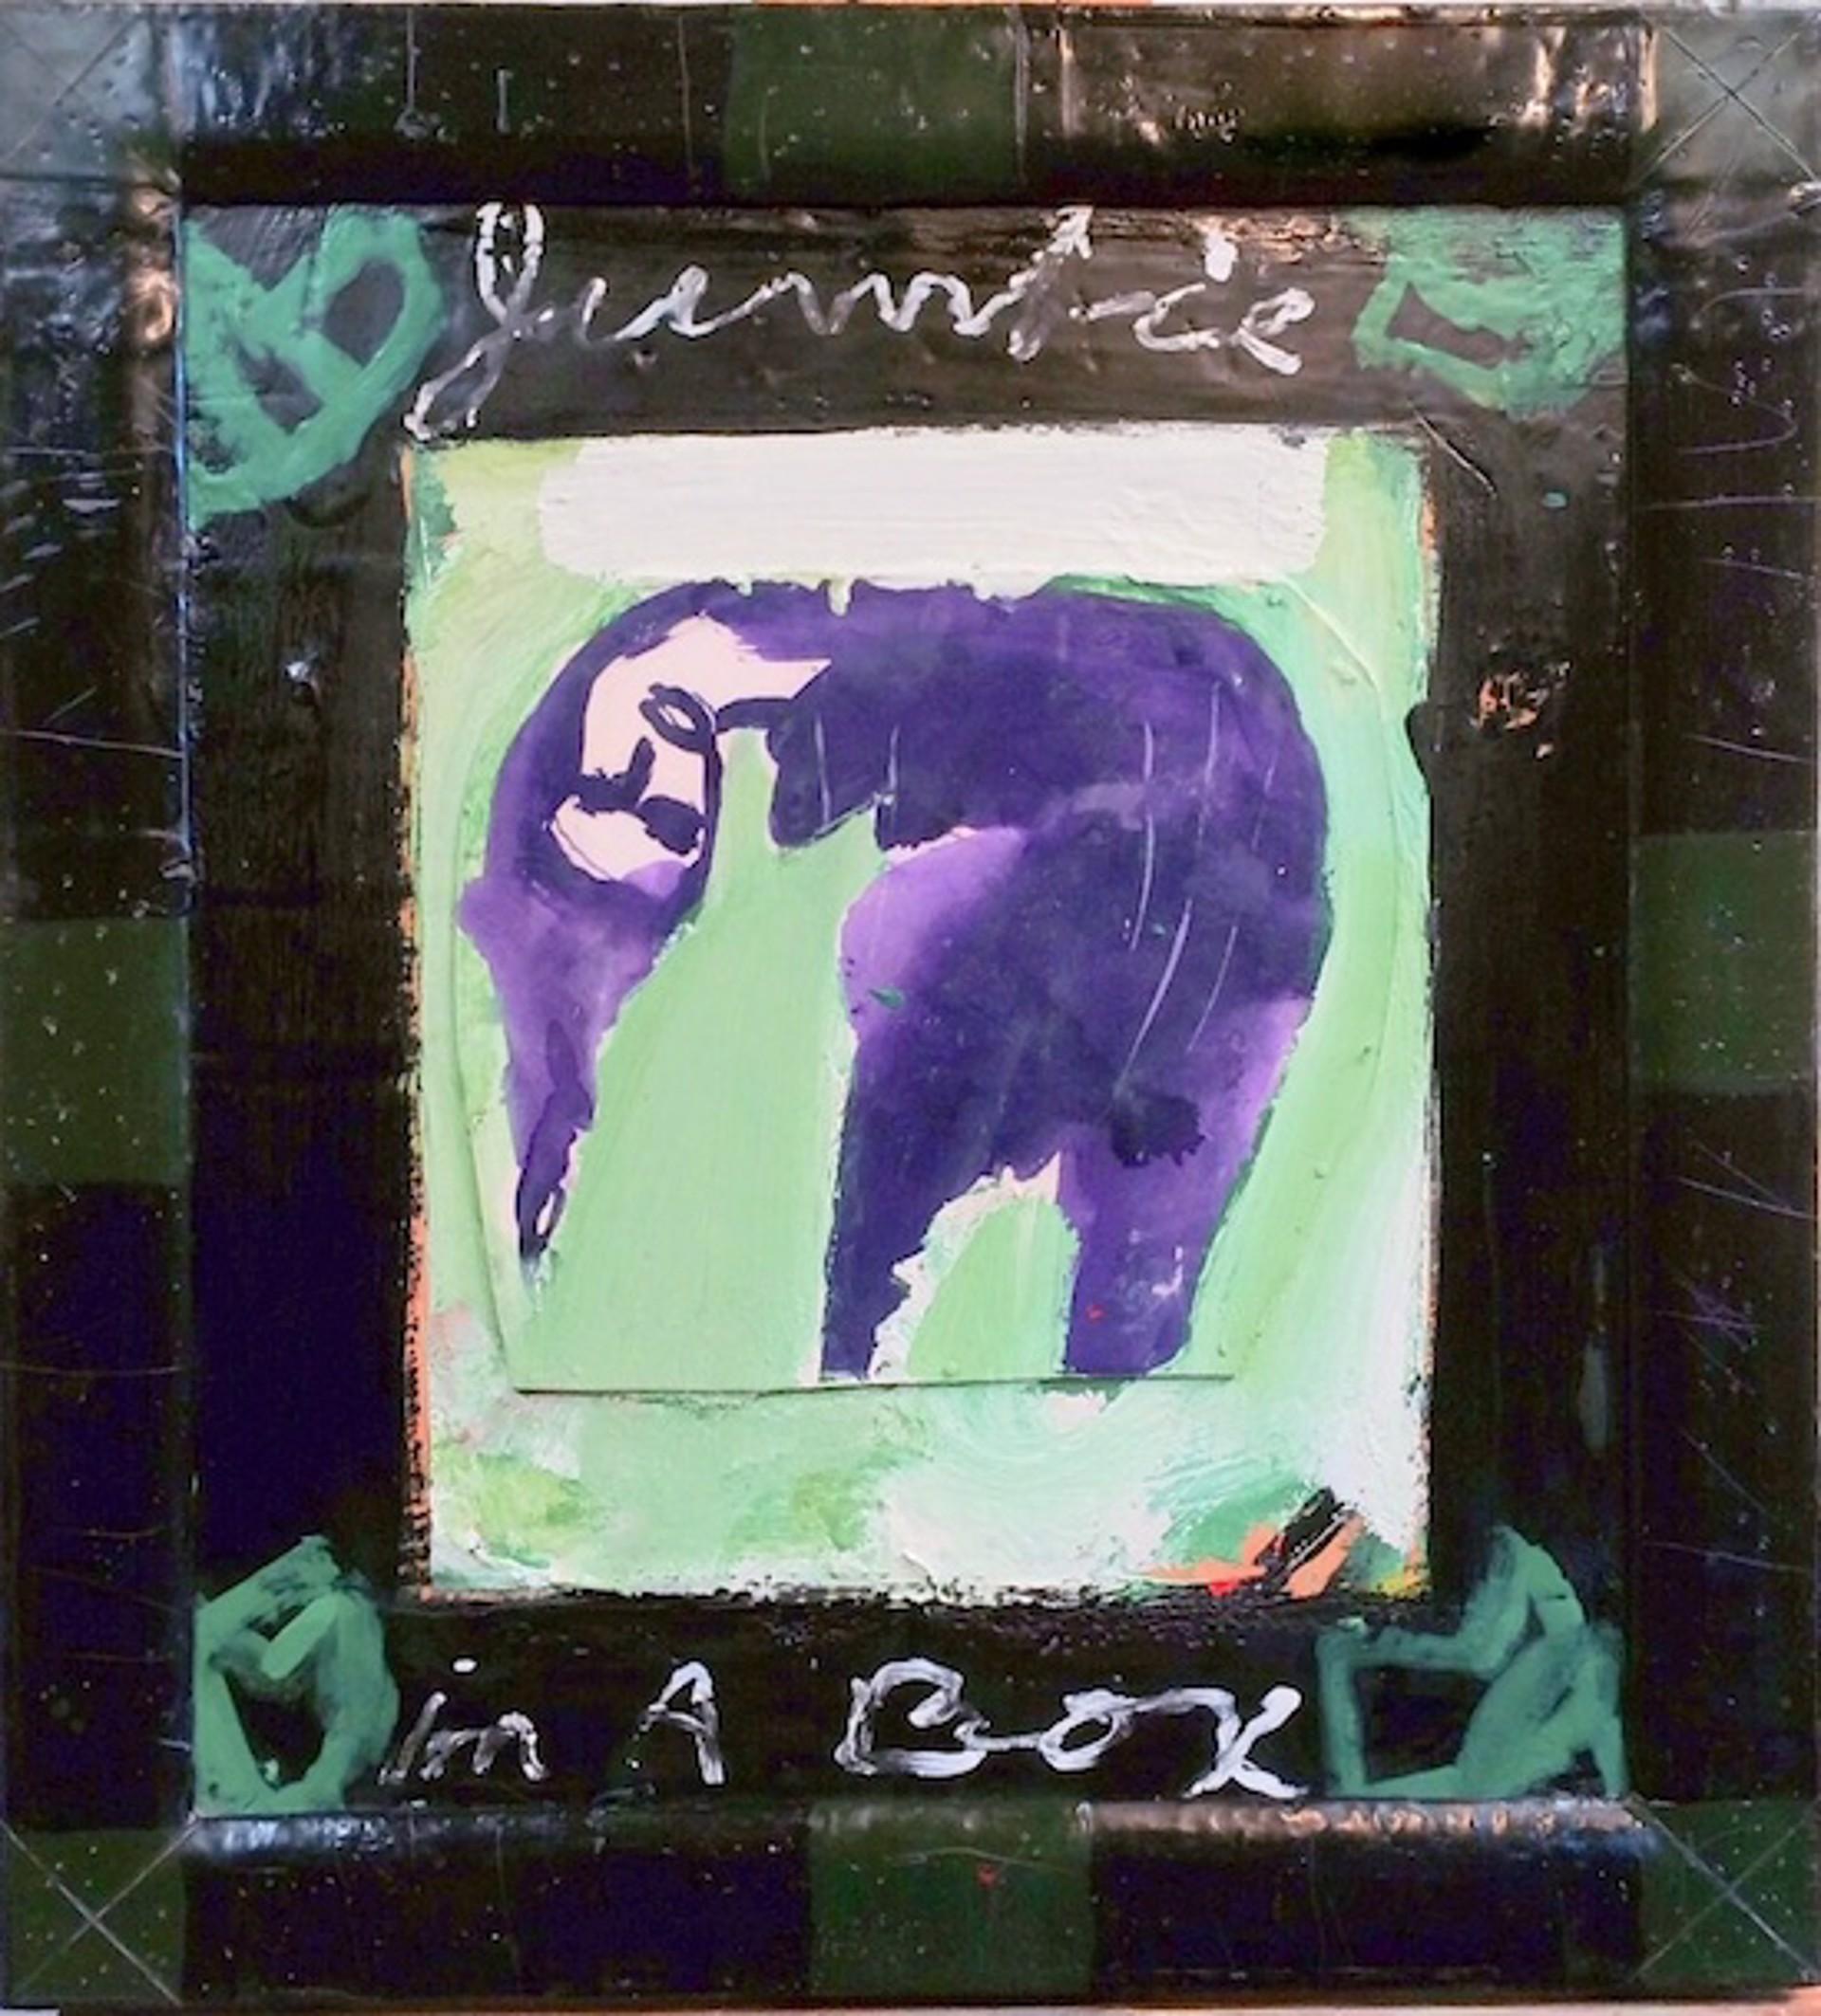 Jumbie in a Box by James Havard